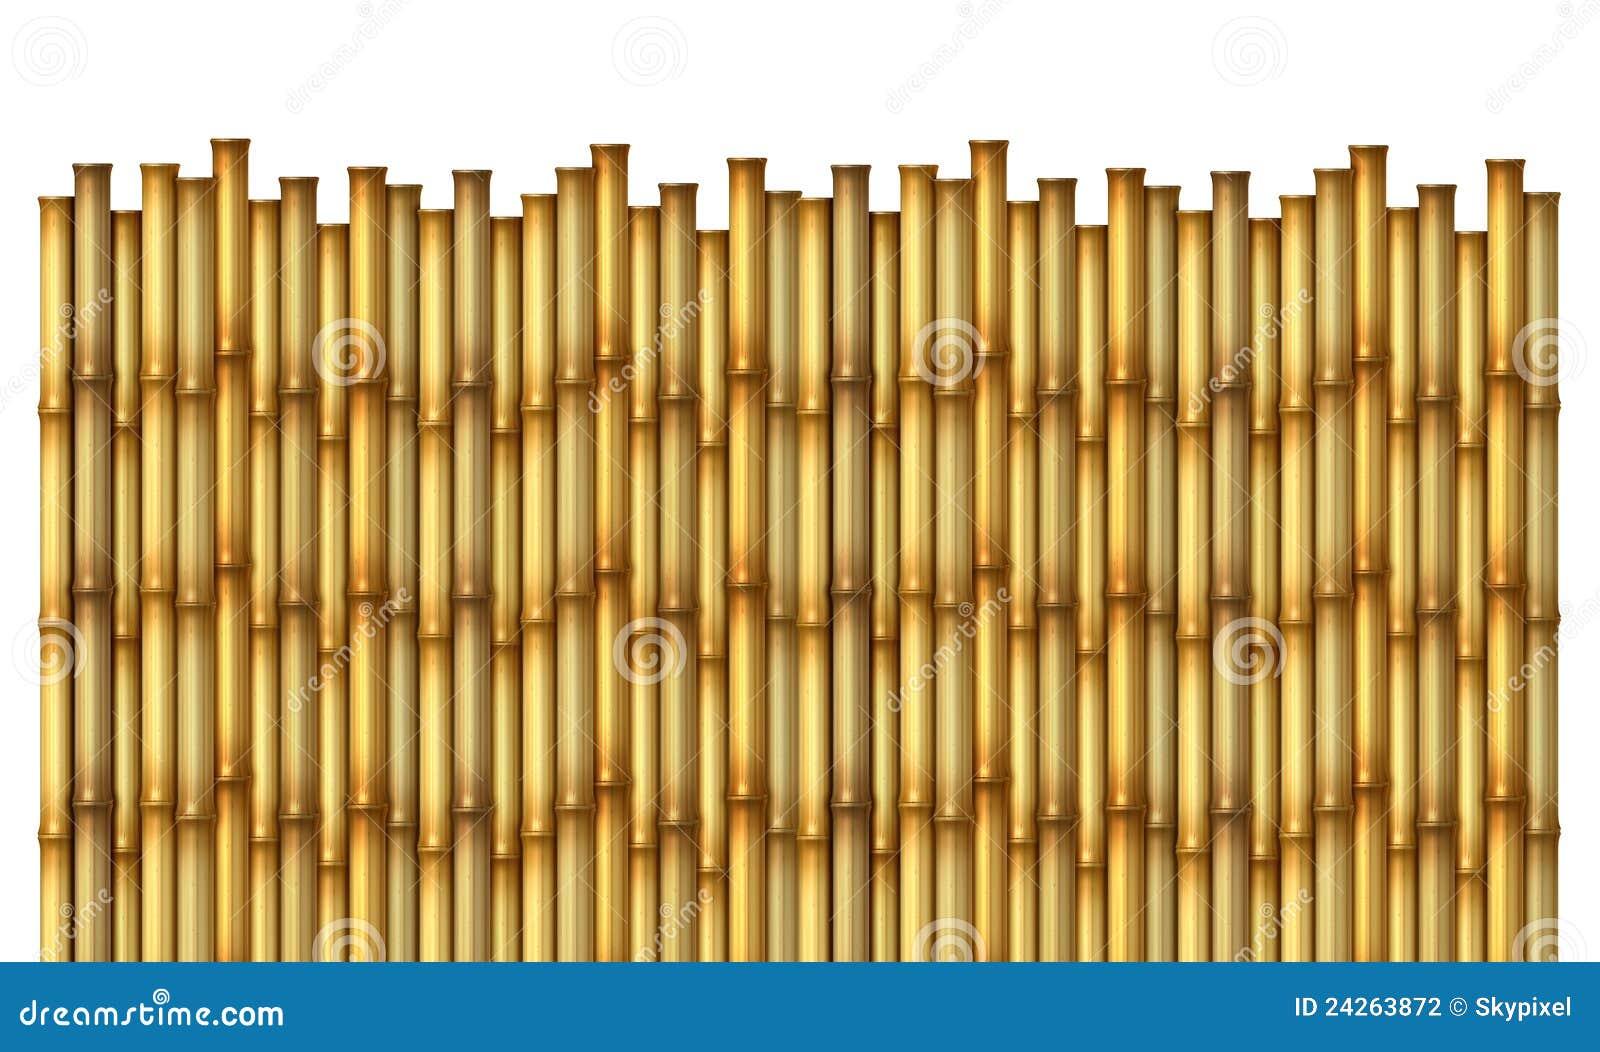 bambuszaun stockfotografie bild 24263872. Black Bedroom Furniture Sets. Home Design Ideas